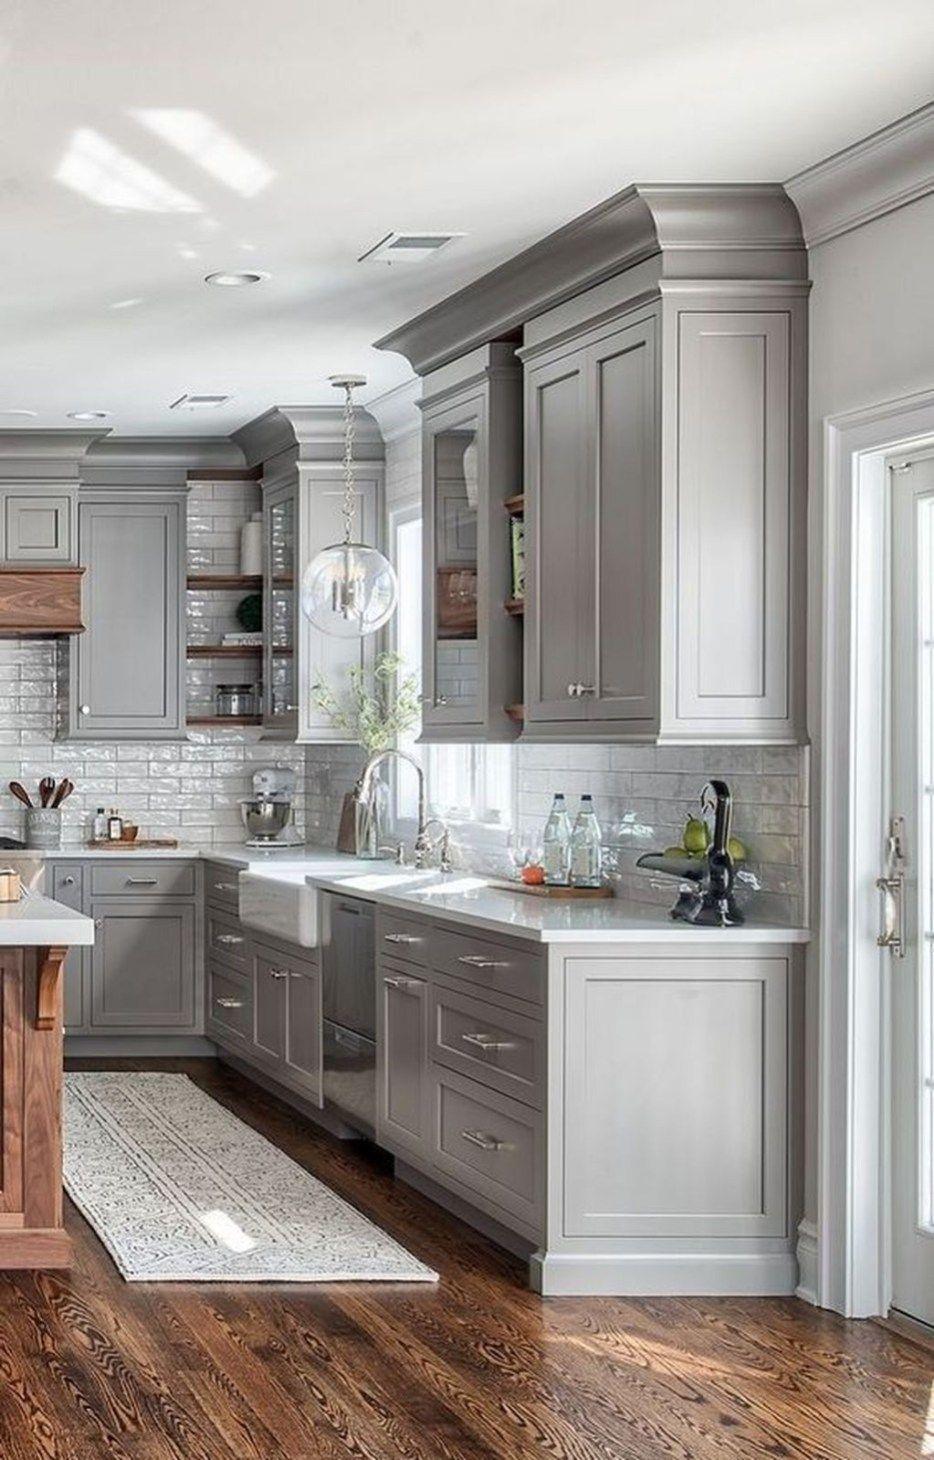 34 Luxury Farmhouse Kitchen Design Ideas To Bring Modern Look – Trendehouse